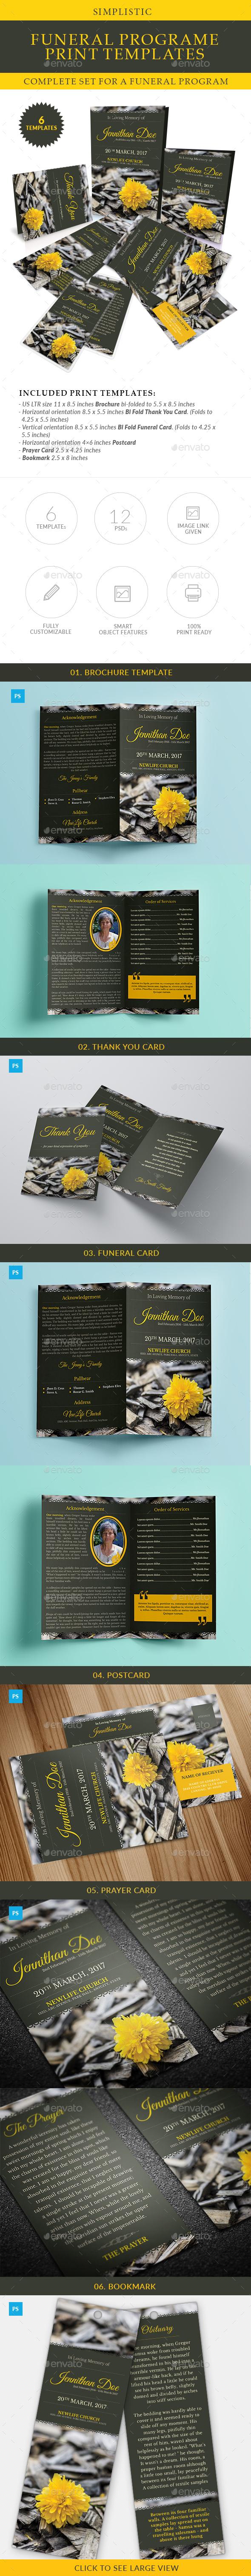 Simplistic Funeral Program Print Templates Combo Set - Miscellaneous Print Templates